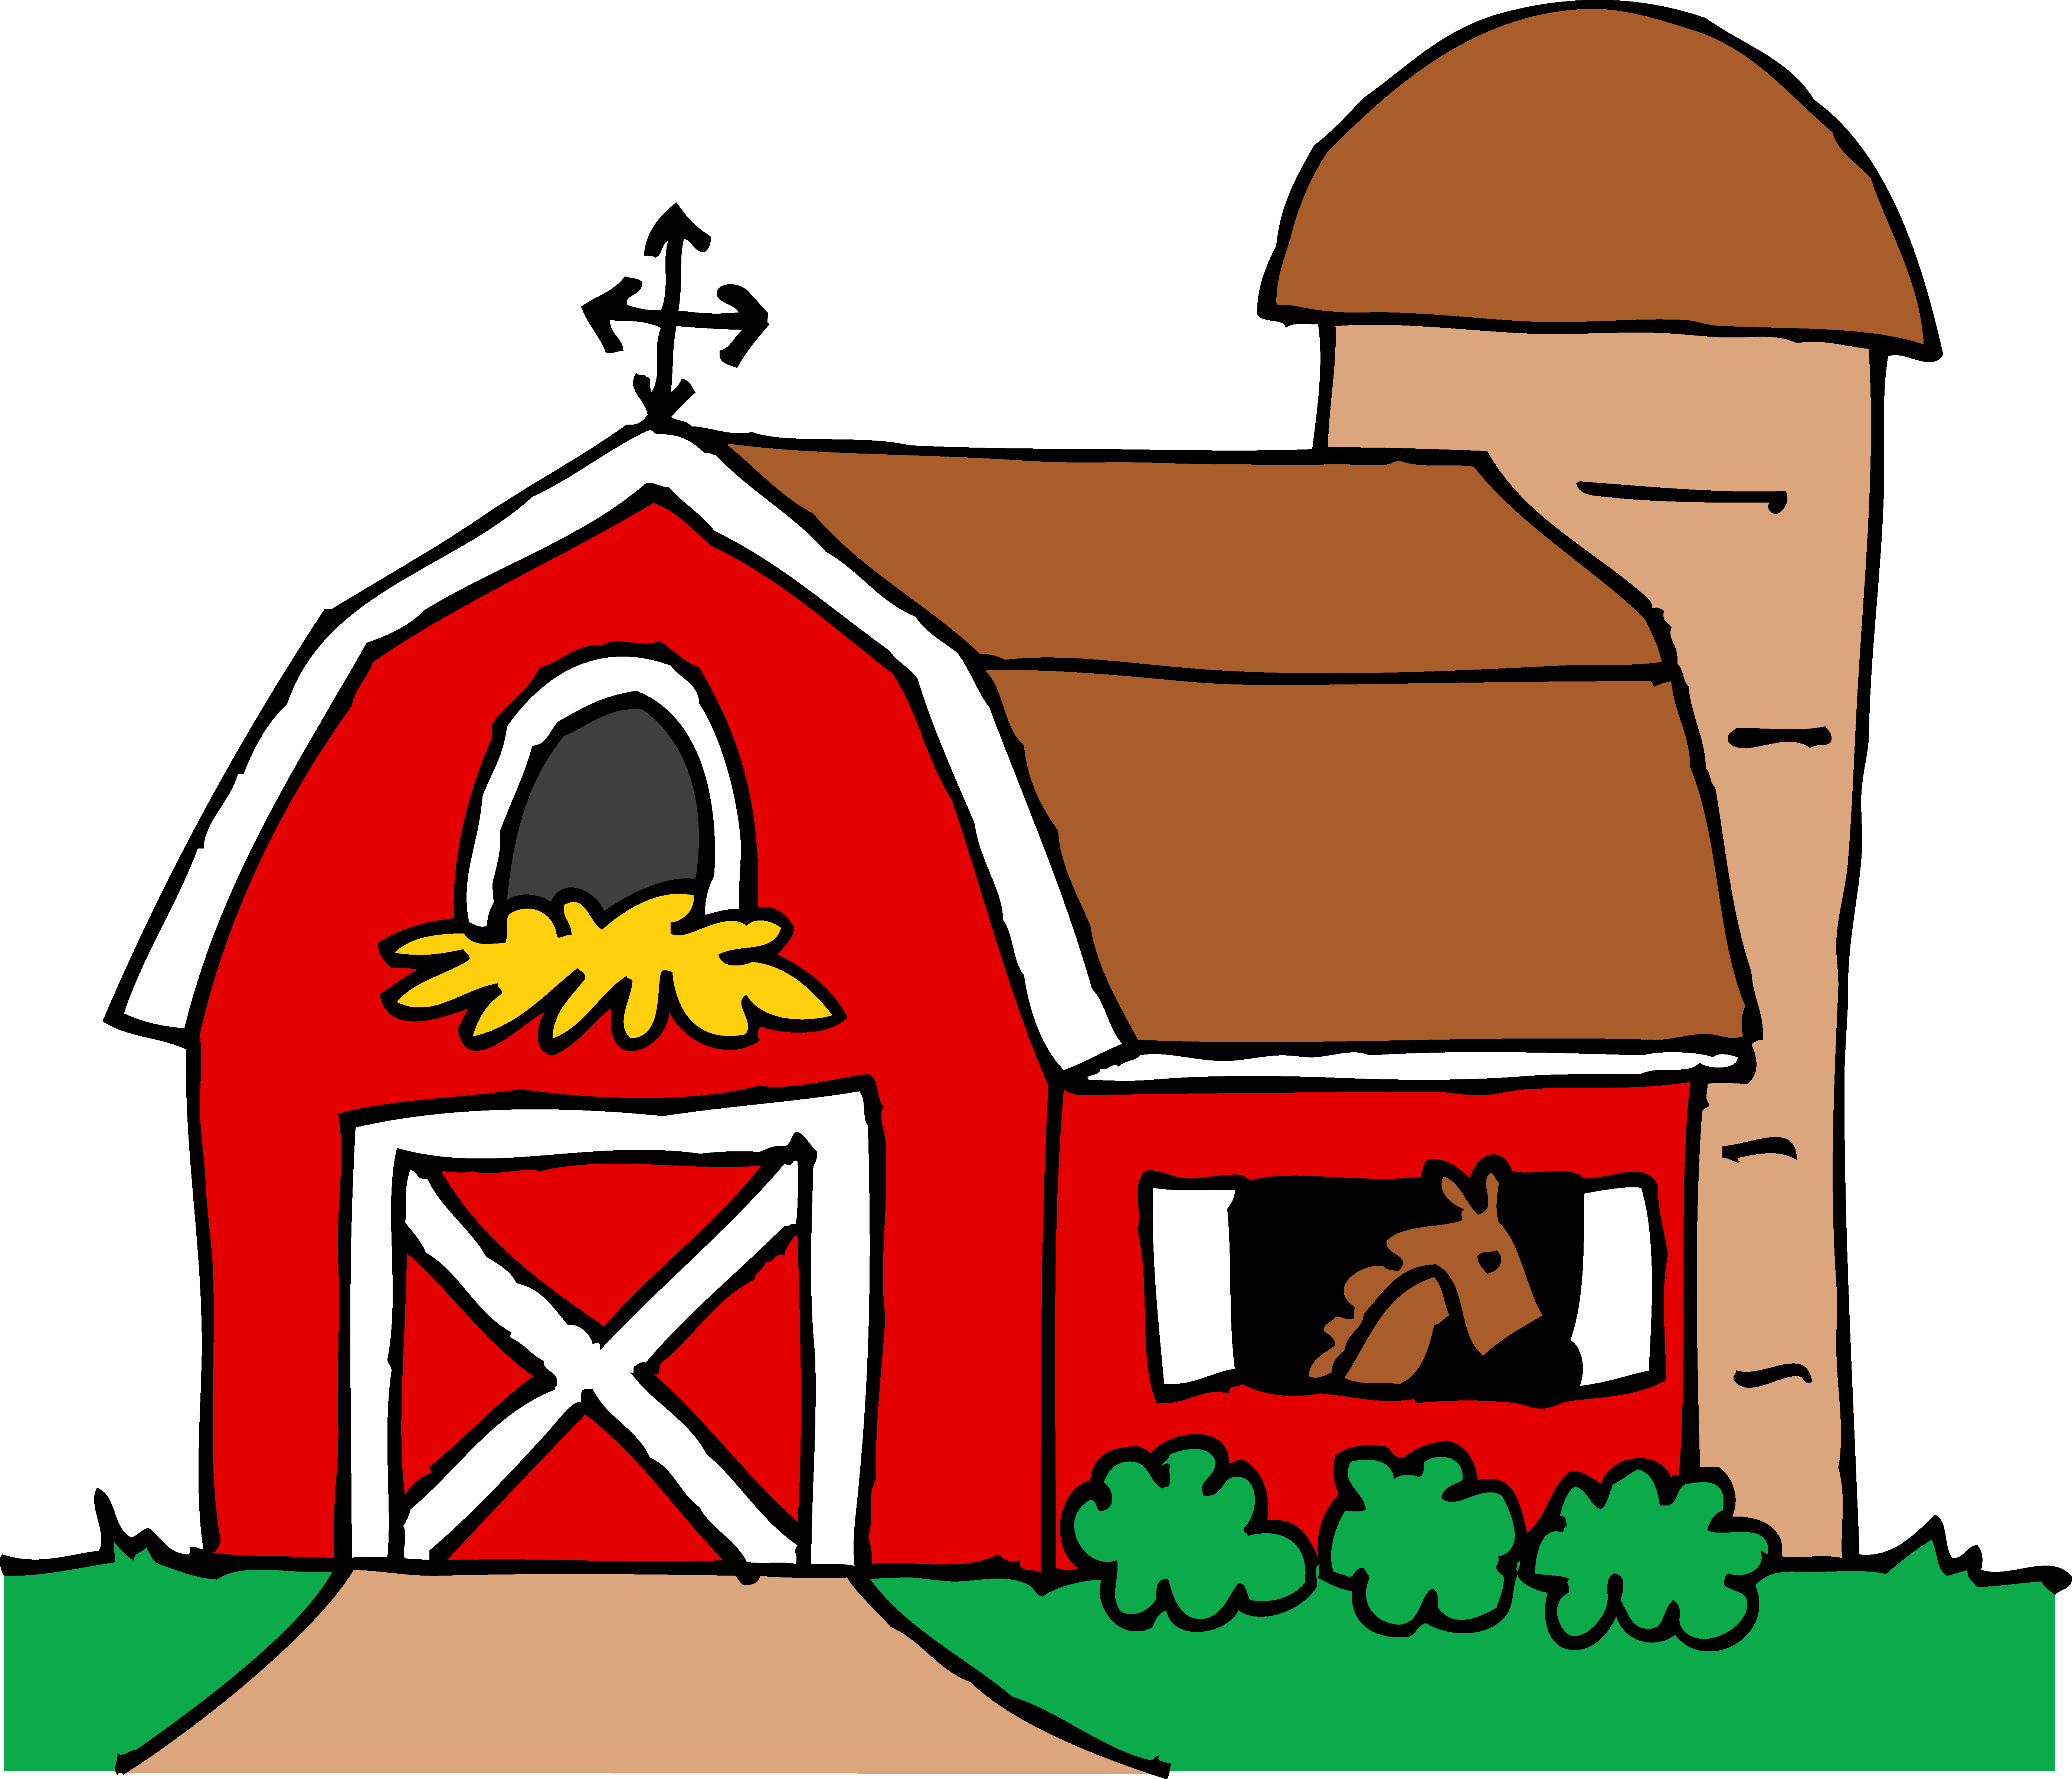 Farmhouse Clipart - Free Clipart Images -Farmhouse Clipart - Free Clipart Images .-11